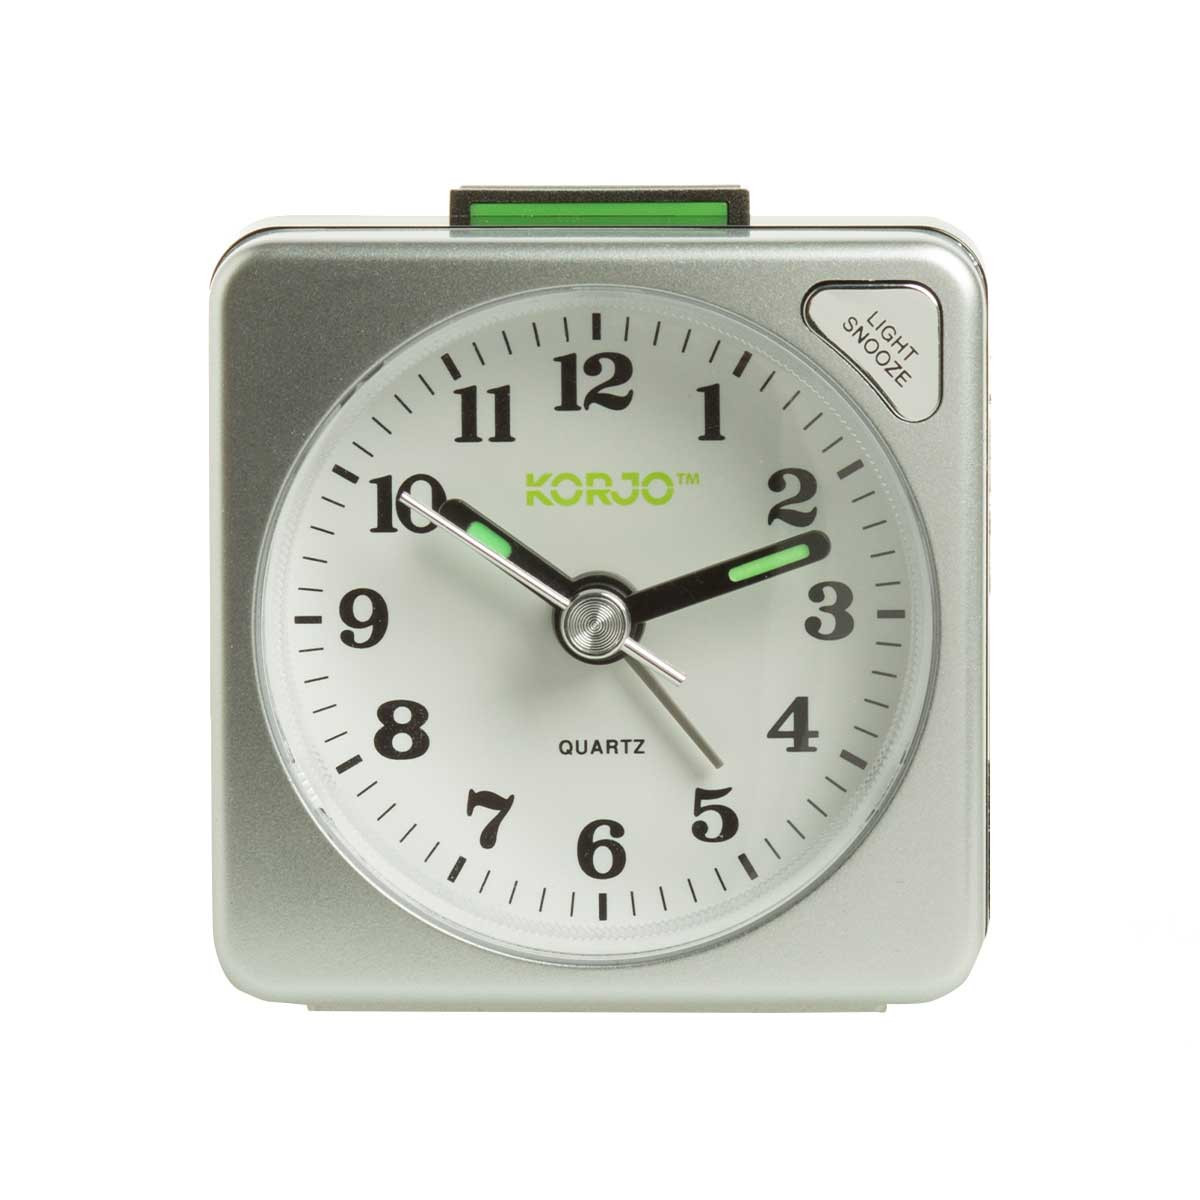 Korjo analogue alarm clock